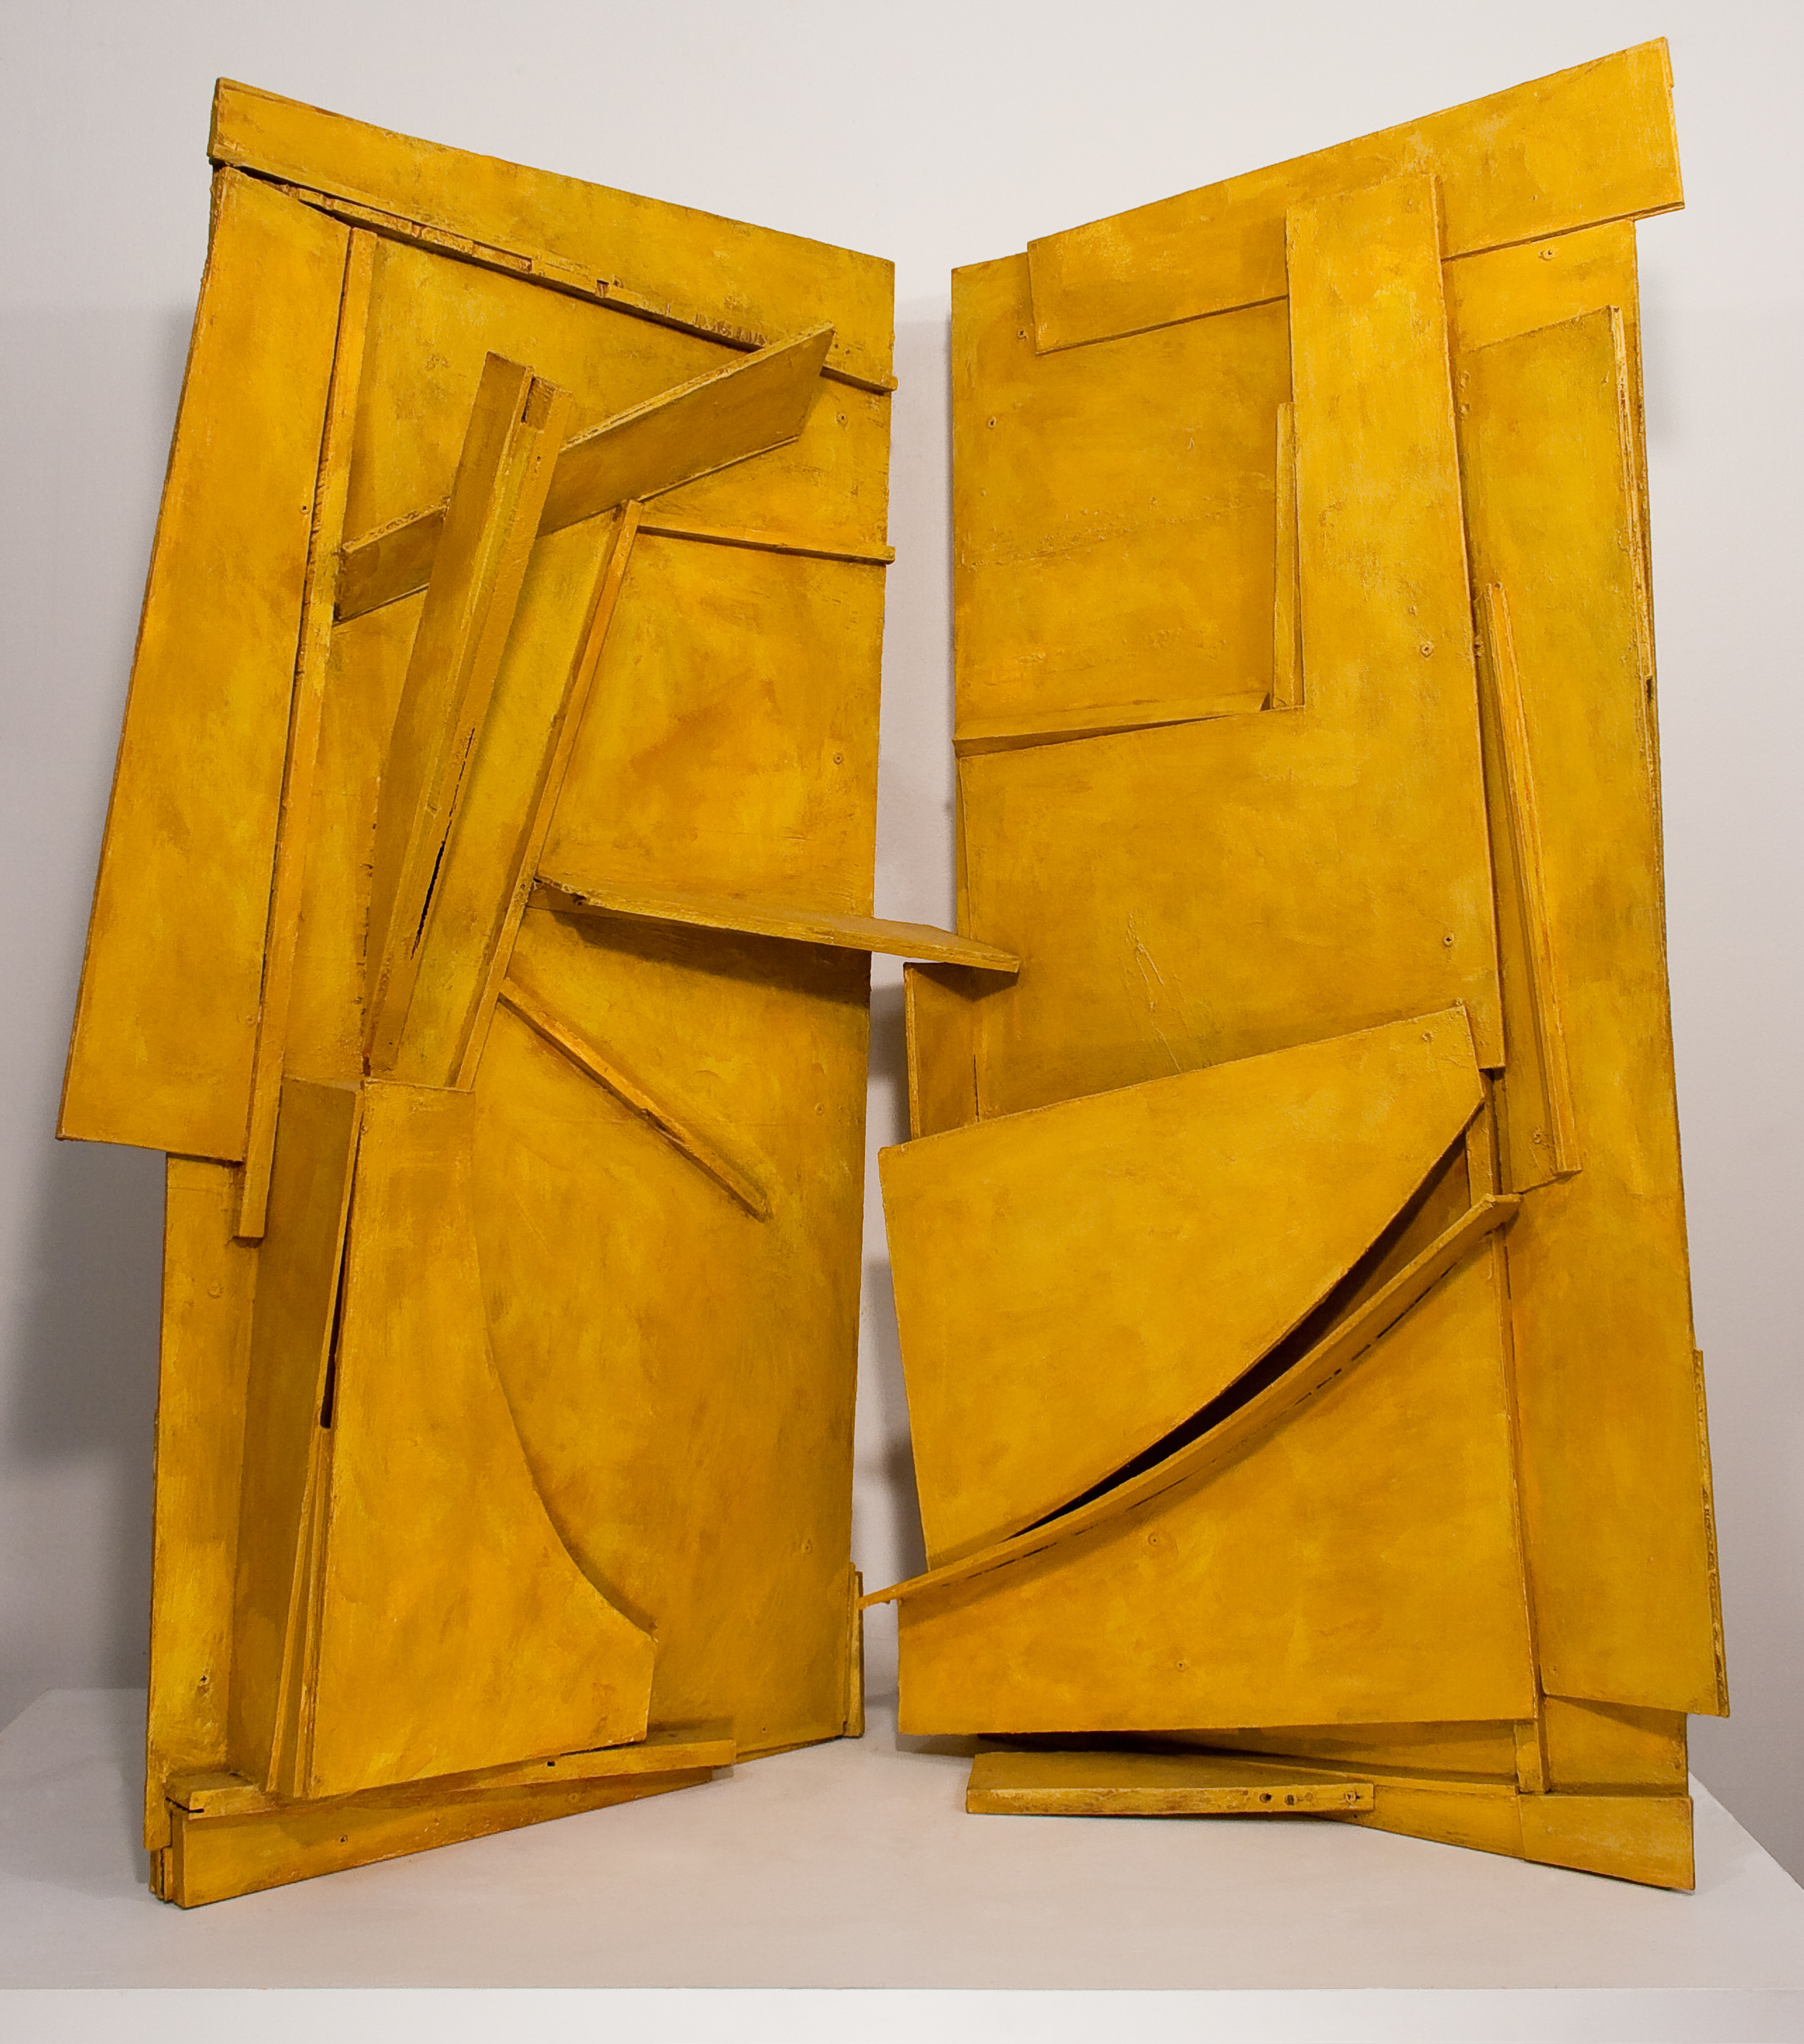 "Duet, found wood, acrylic, cement, ochre, 50"" x 64"" x 42"", 2014"